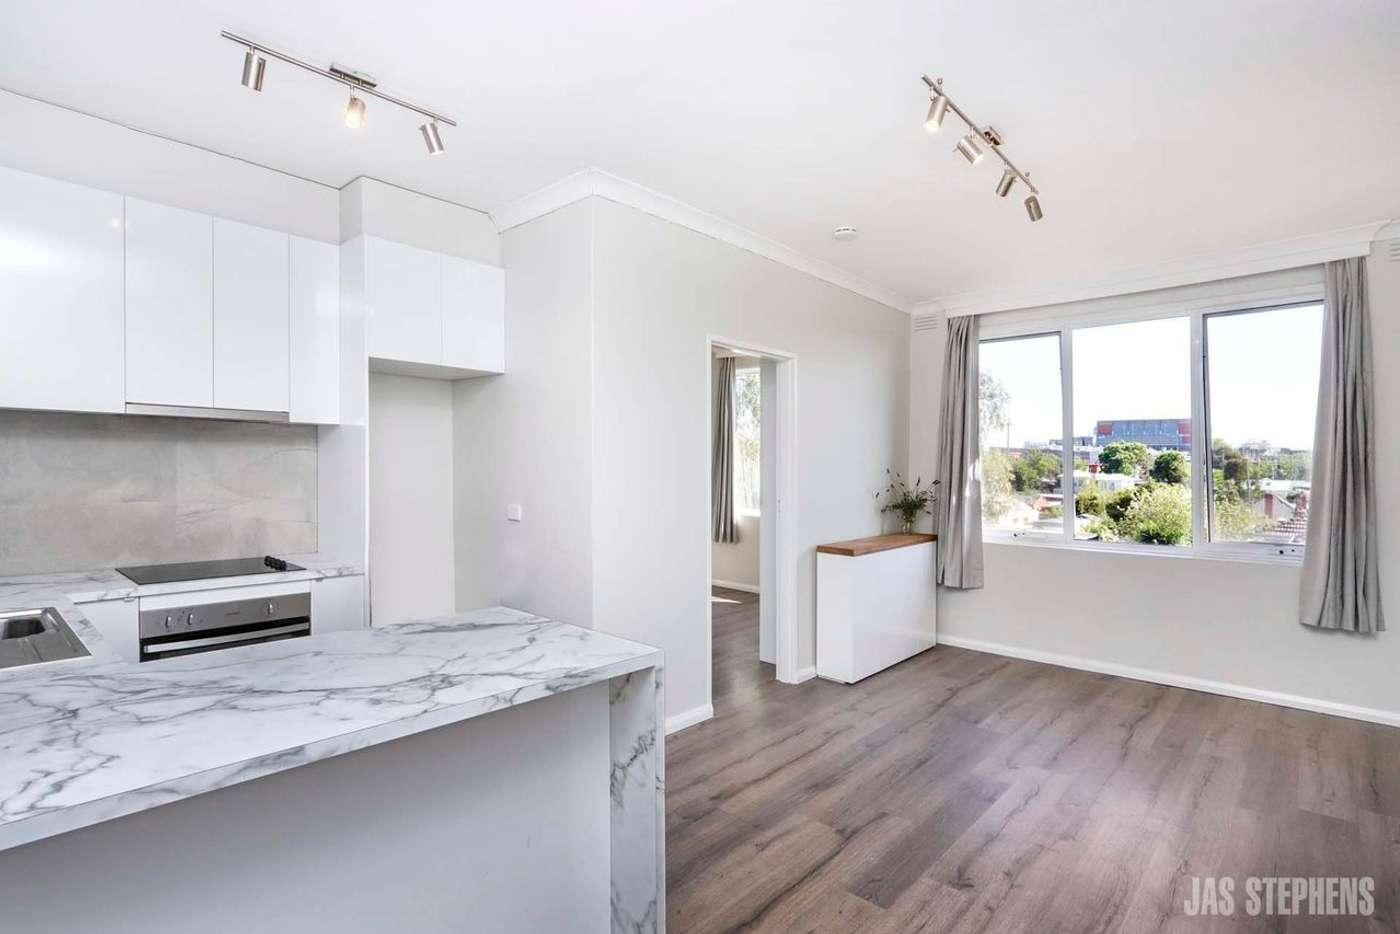 Main view of Homely apartment listing, 23/294 Nicholson Street, Seddon VIC 3011